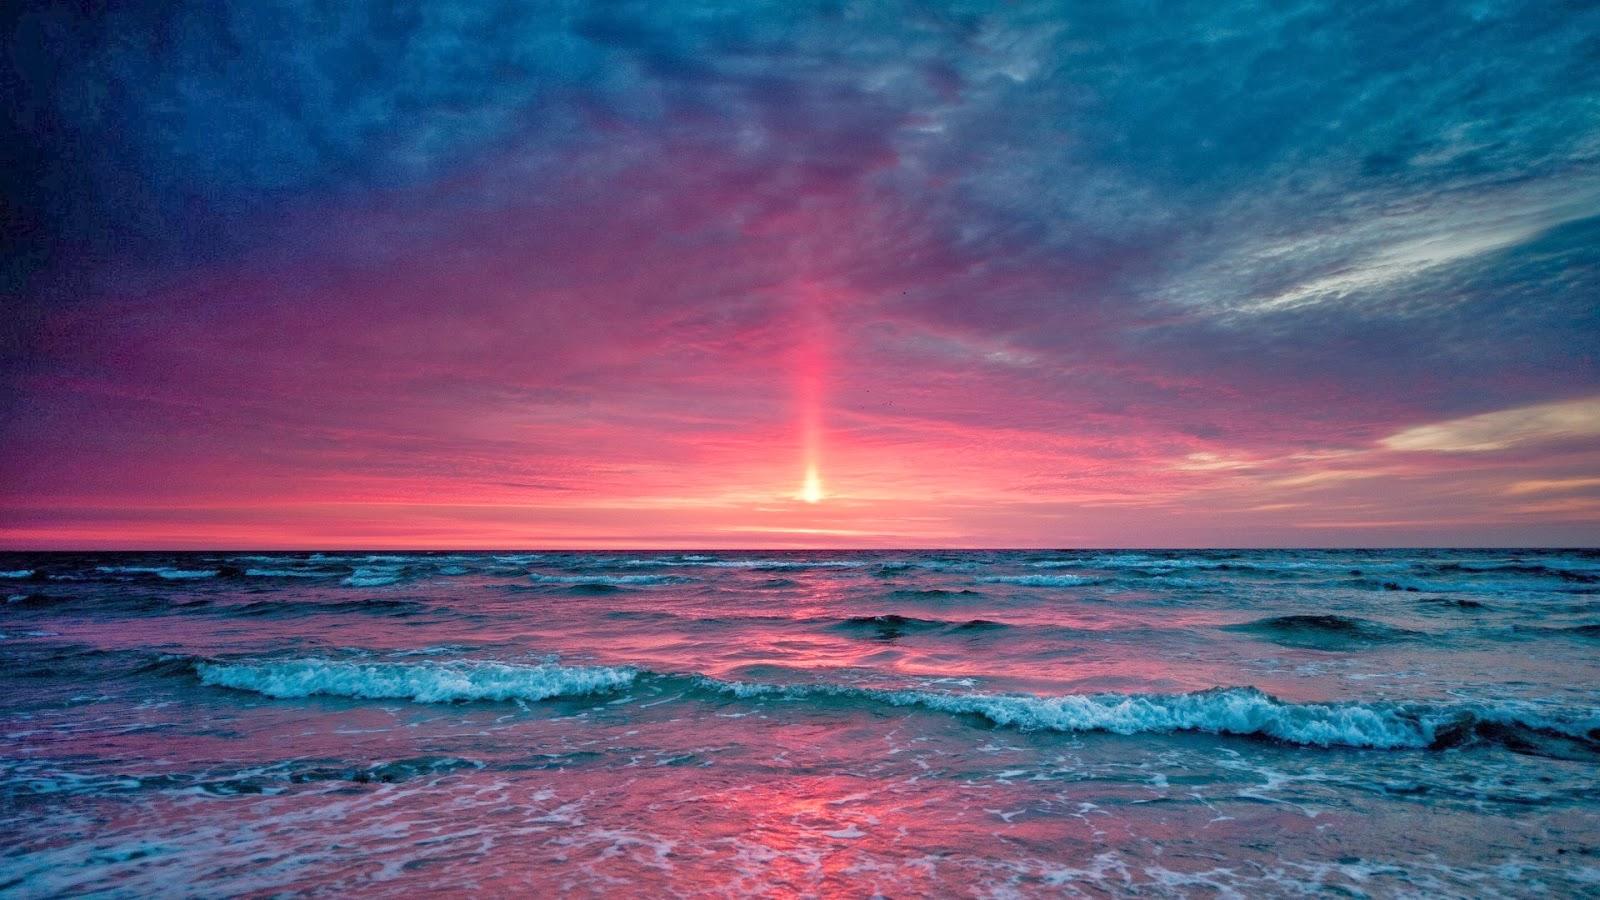 Ang lica italia paul mauriat el sol el cielo y el mar for Immagini alta definizione per desktop